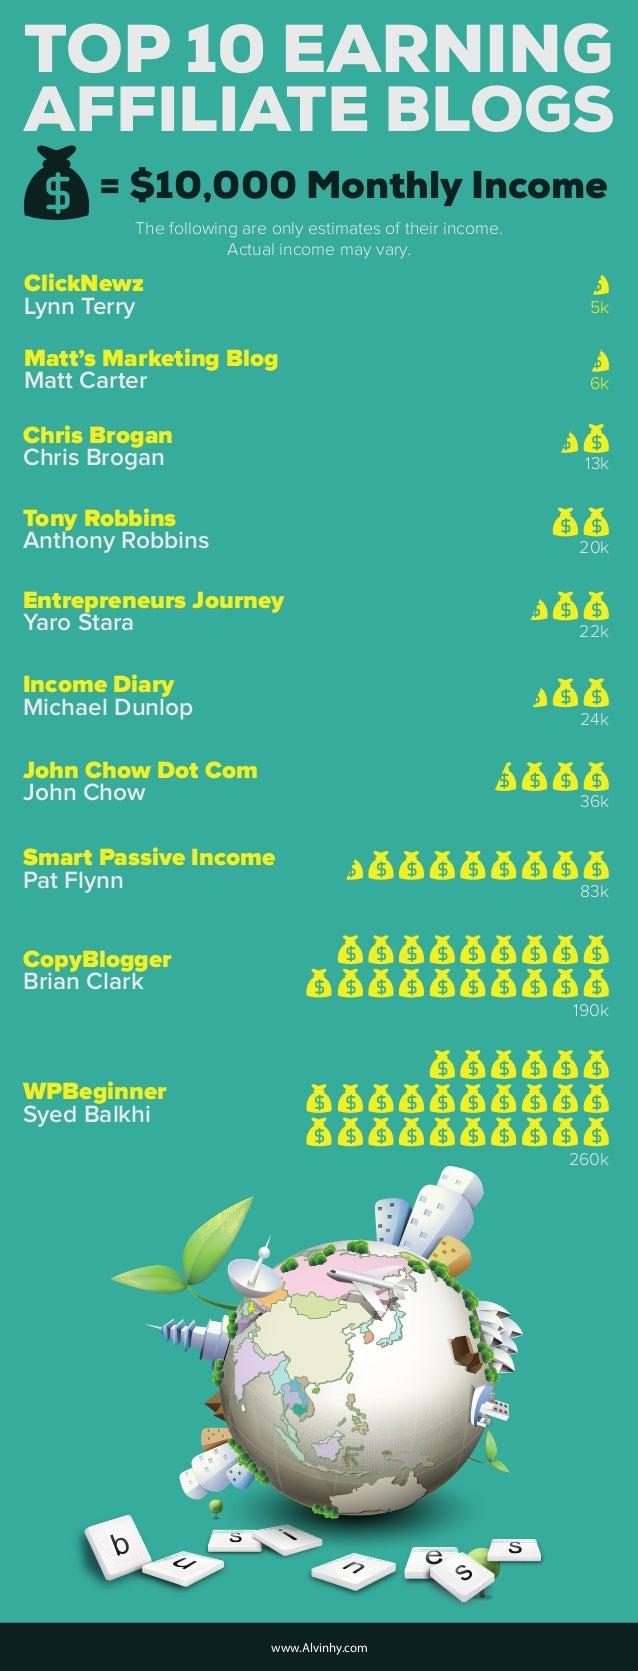 TOP 10 EARNING ClickNewz Lynn Terry Matt's Marketing Blog Matt Carter Chris Brogan Chris Brogan Tony Robbins Anthony Robbi...